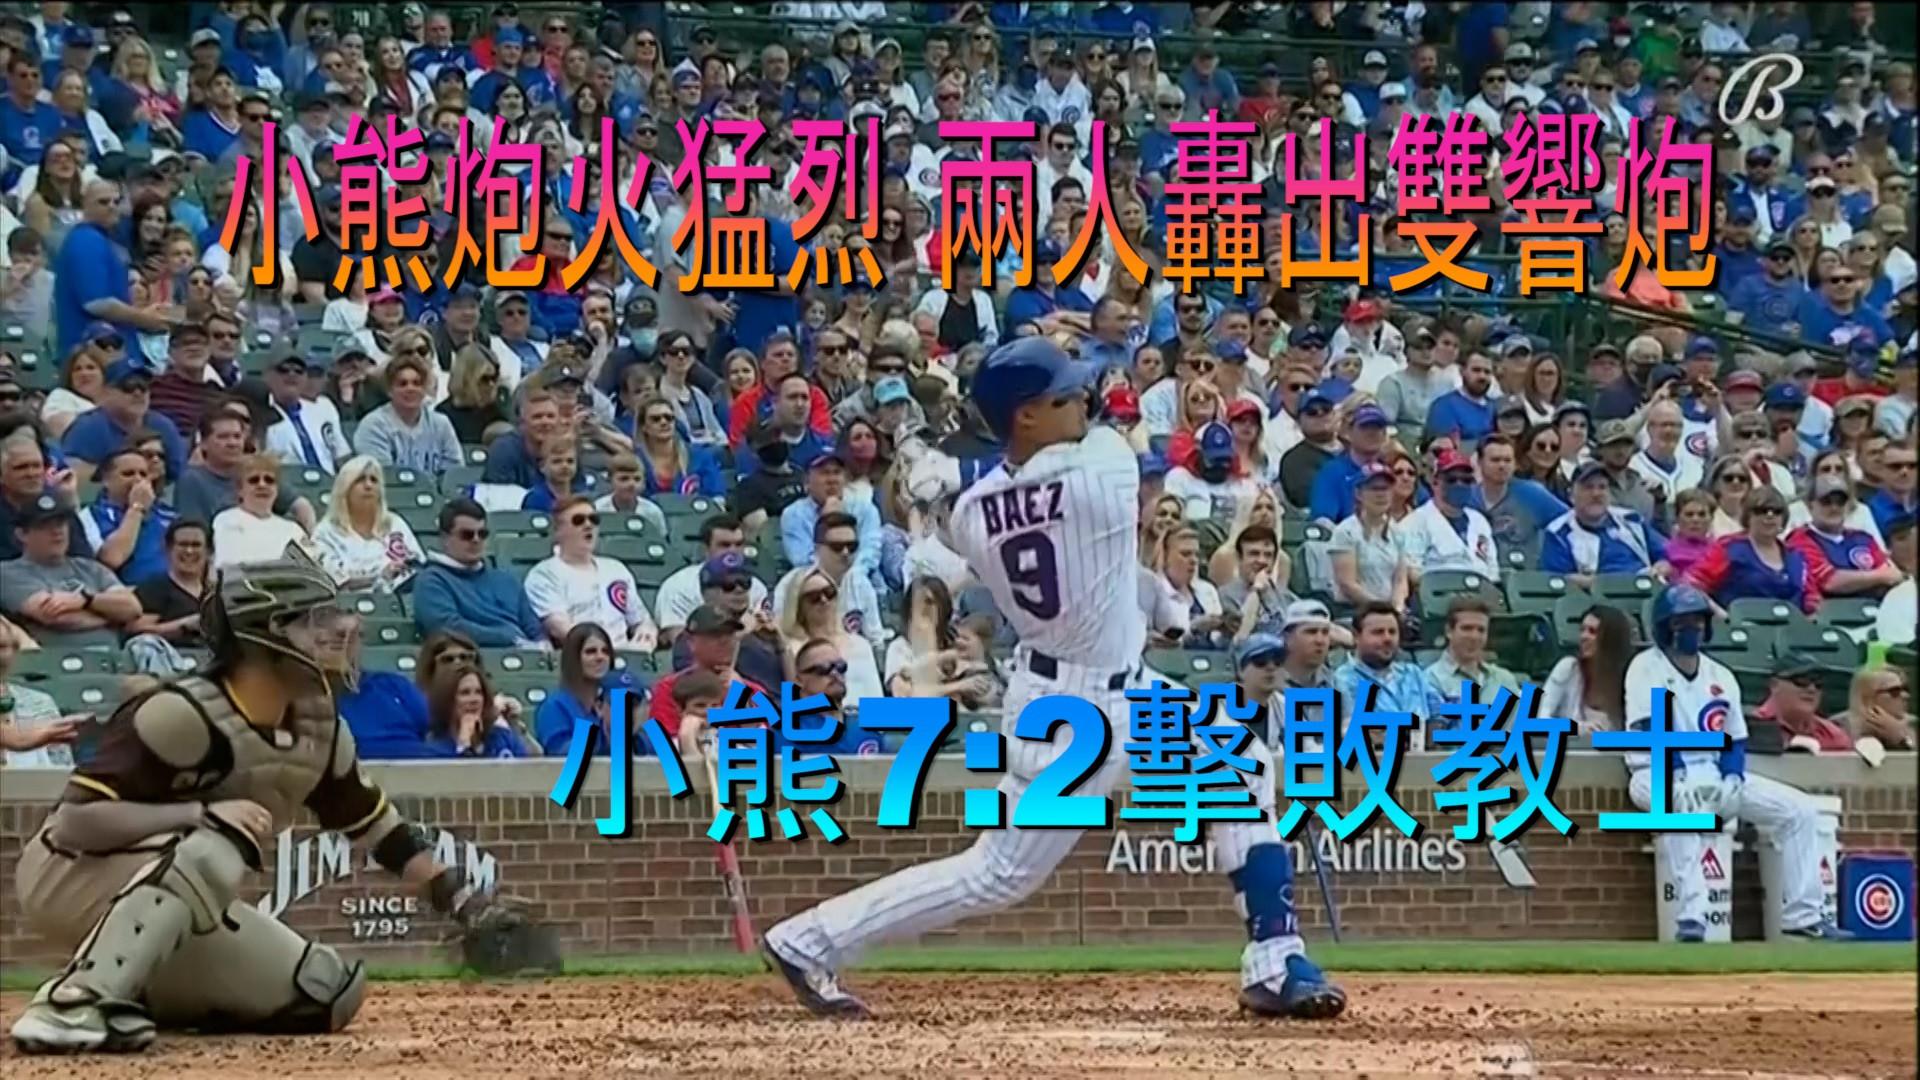 【MLB看愛爾達】小熊克服傷兵困擾 拼出五月最佳戰績 06/01